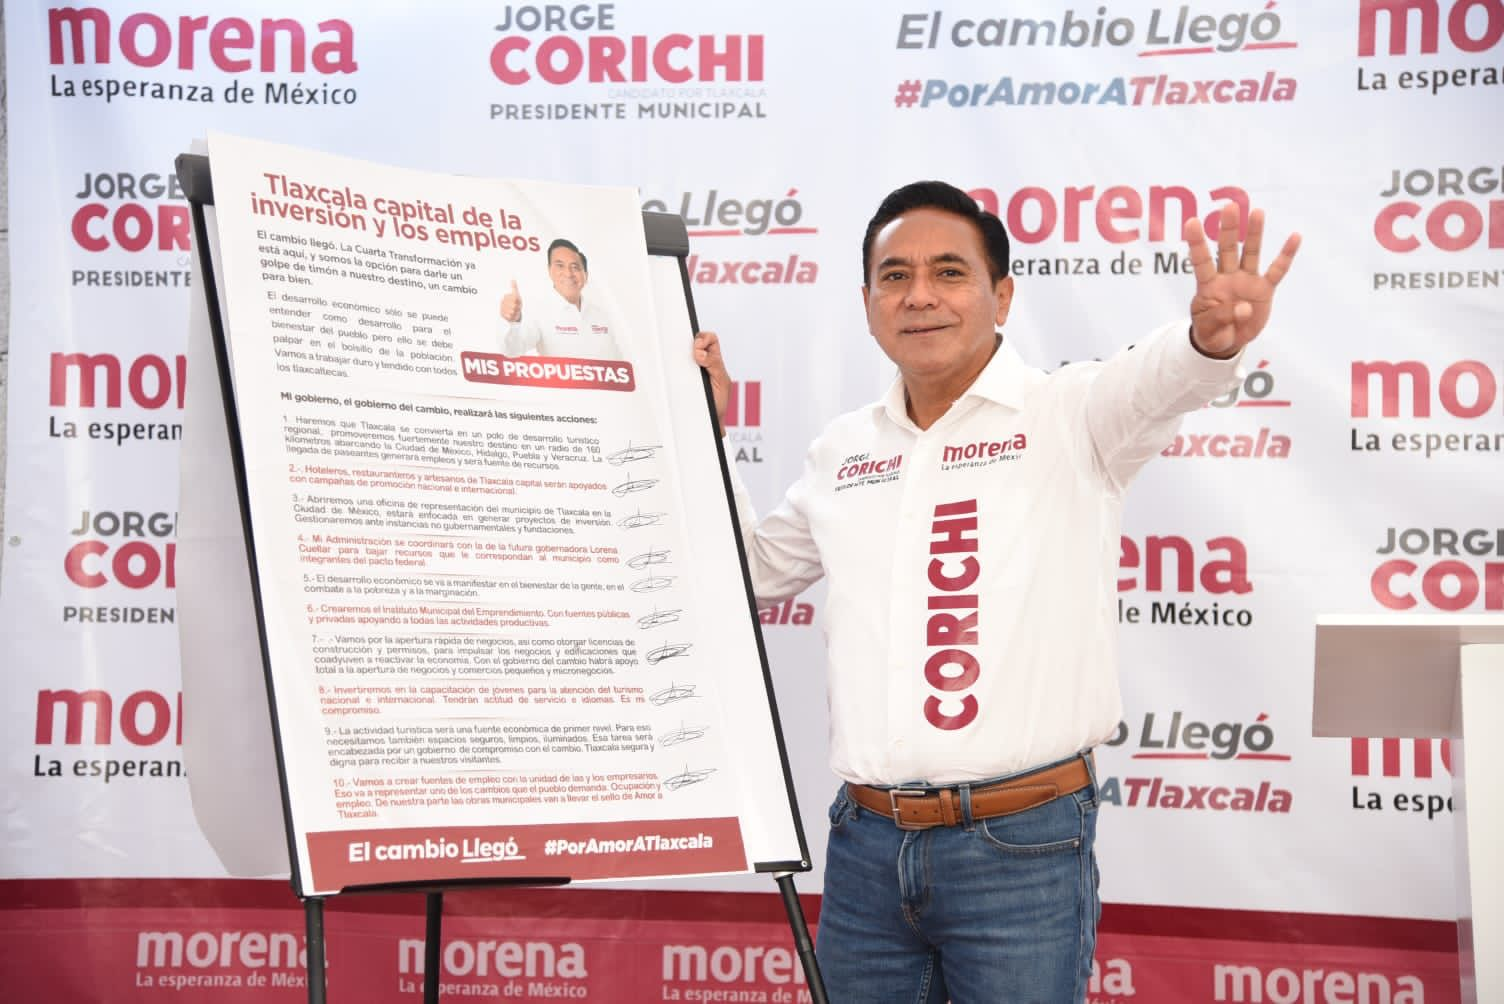 Jorge Corichi proyecta a Tlaxcala como capital de inversión y empleo